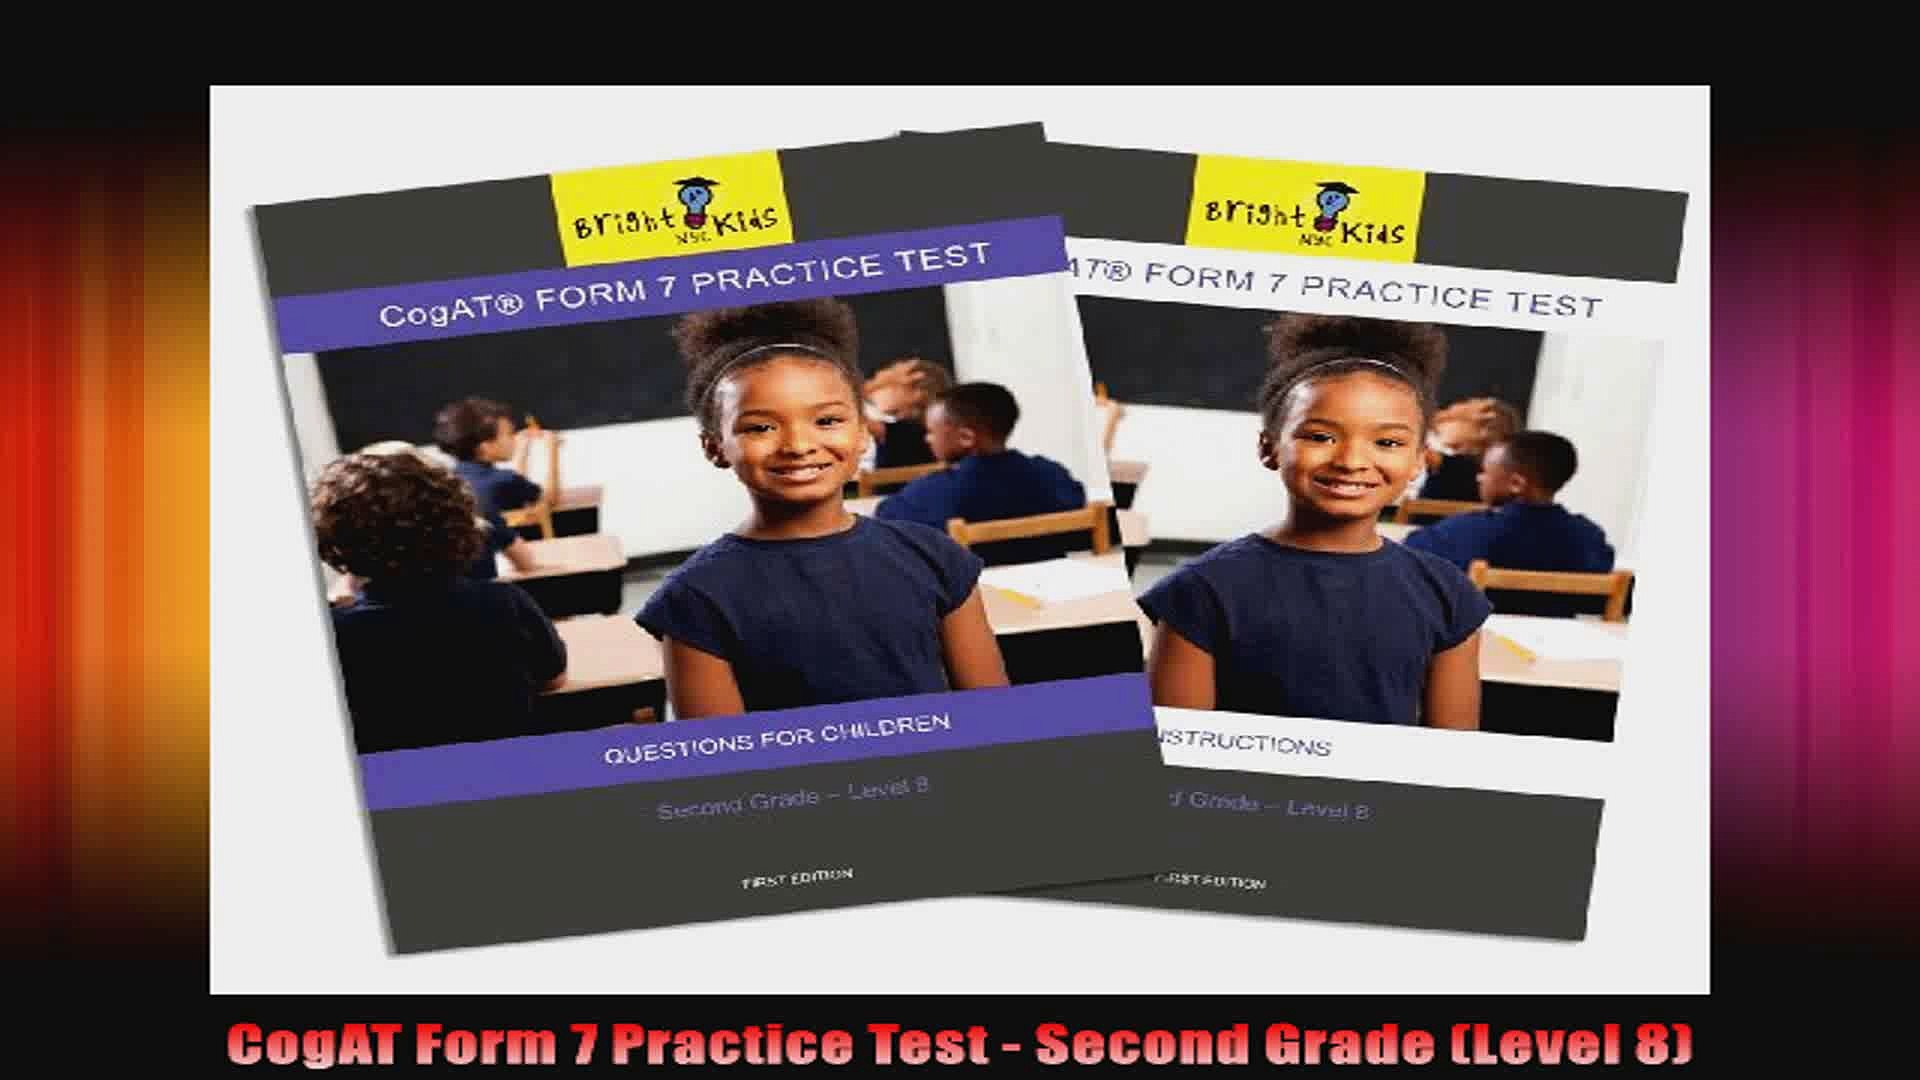 Cogat Form 7 Practice Test Second Grade (level 8)